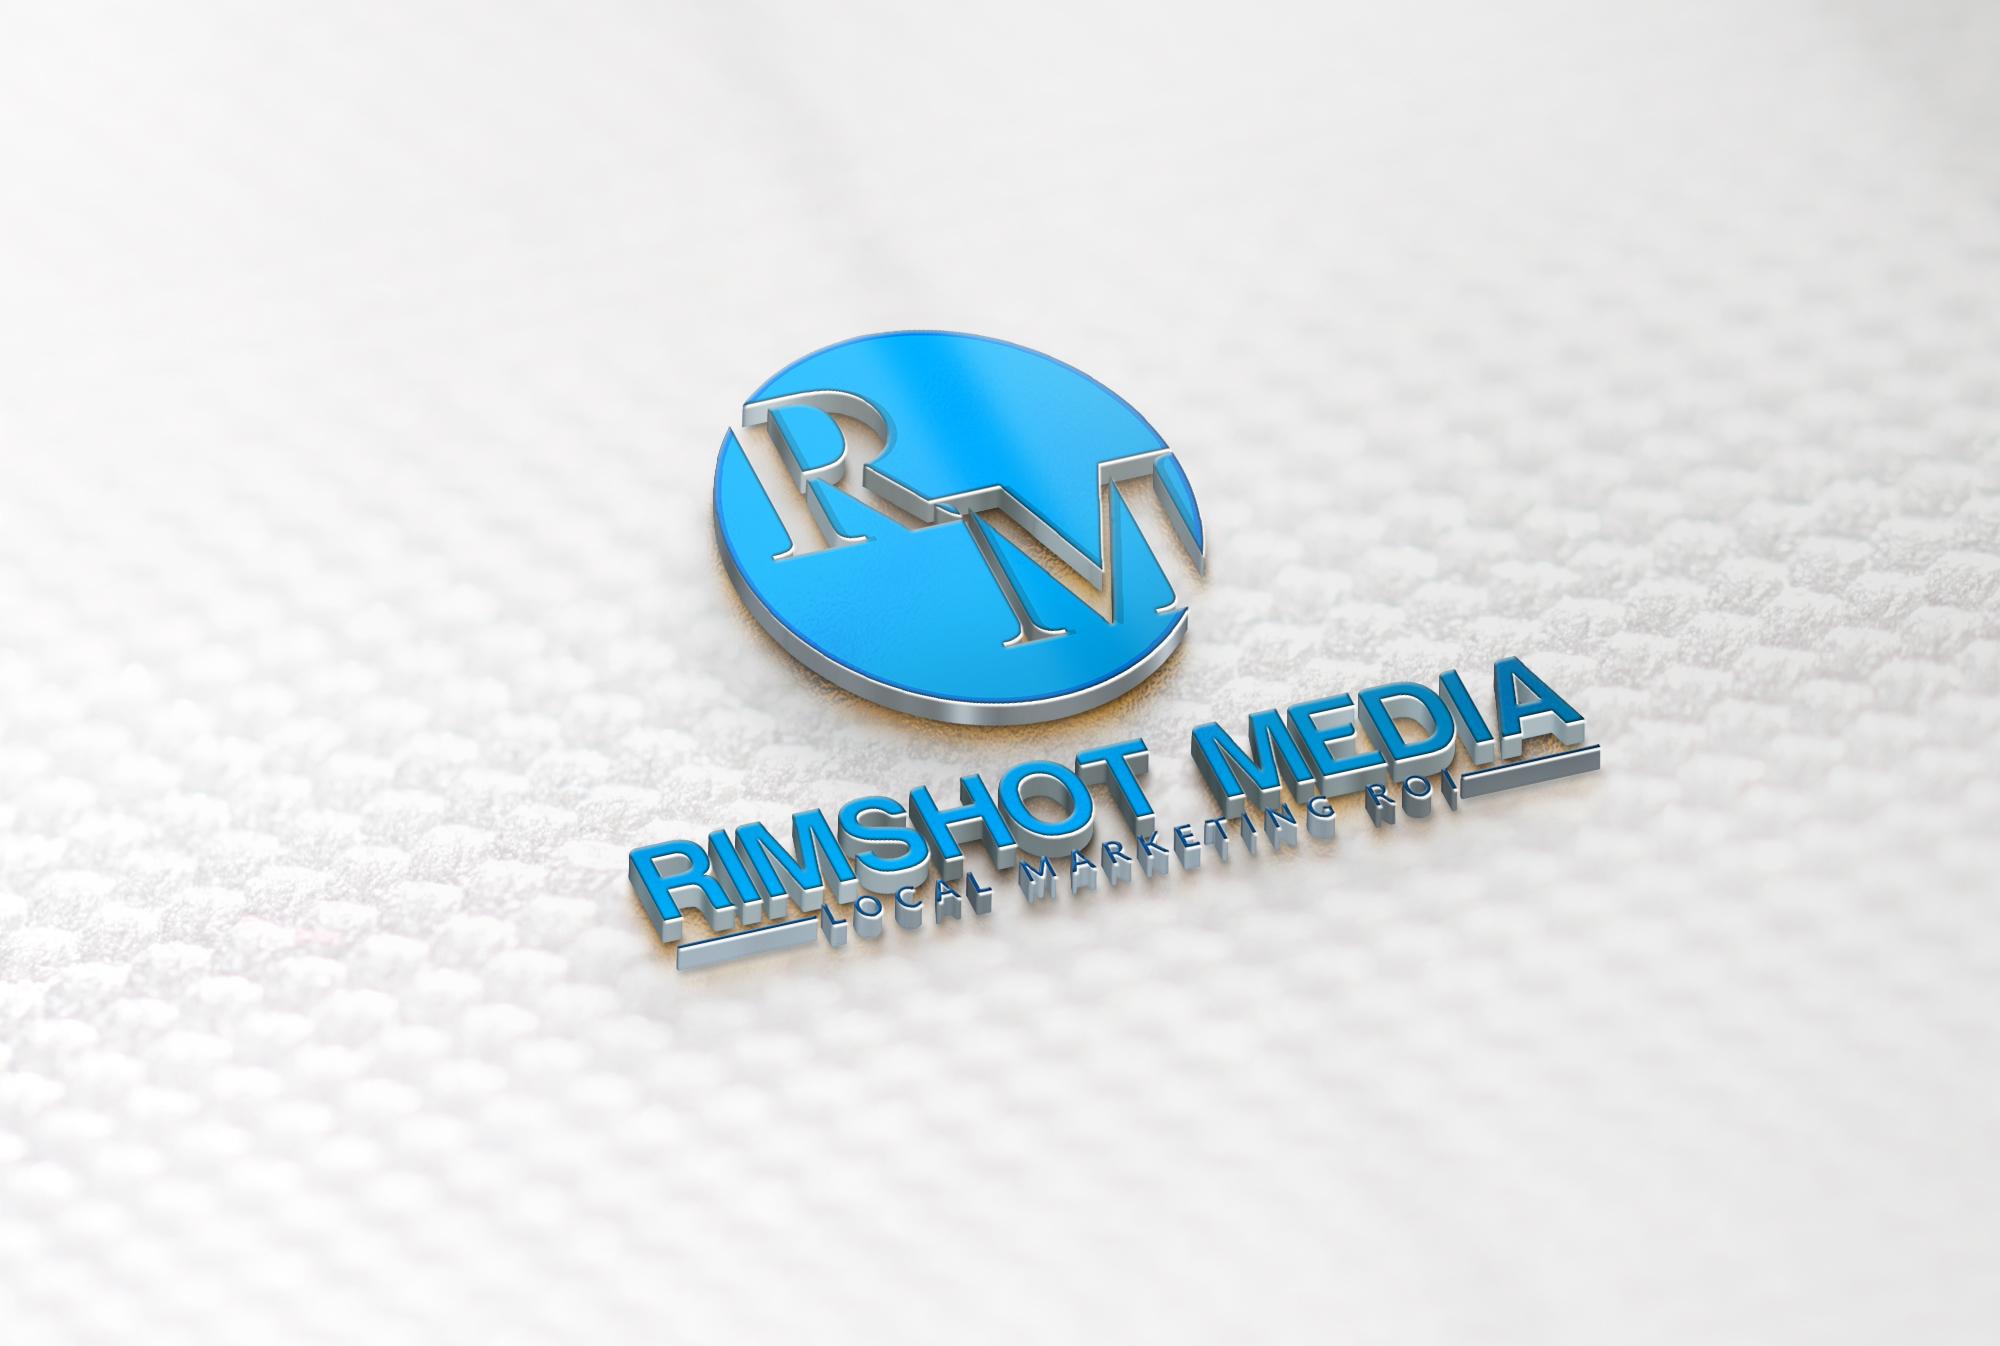 Rimshot-Media-Logo-B 3D Mock-up